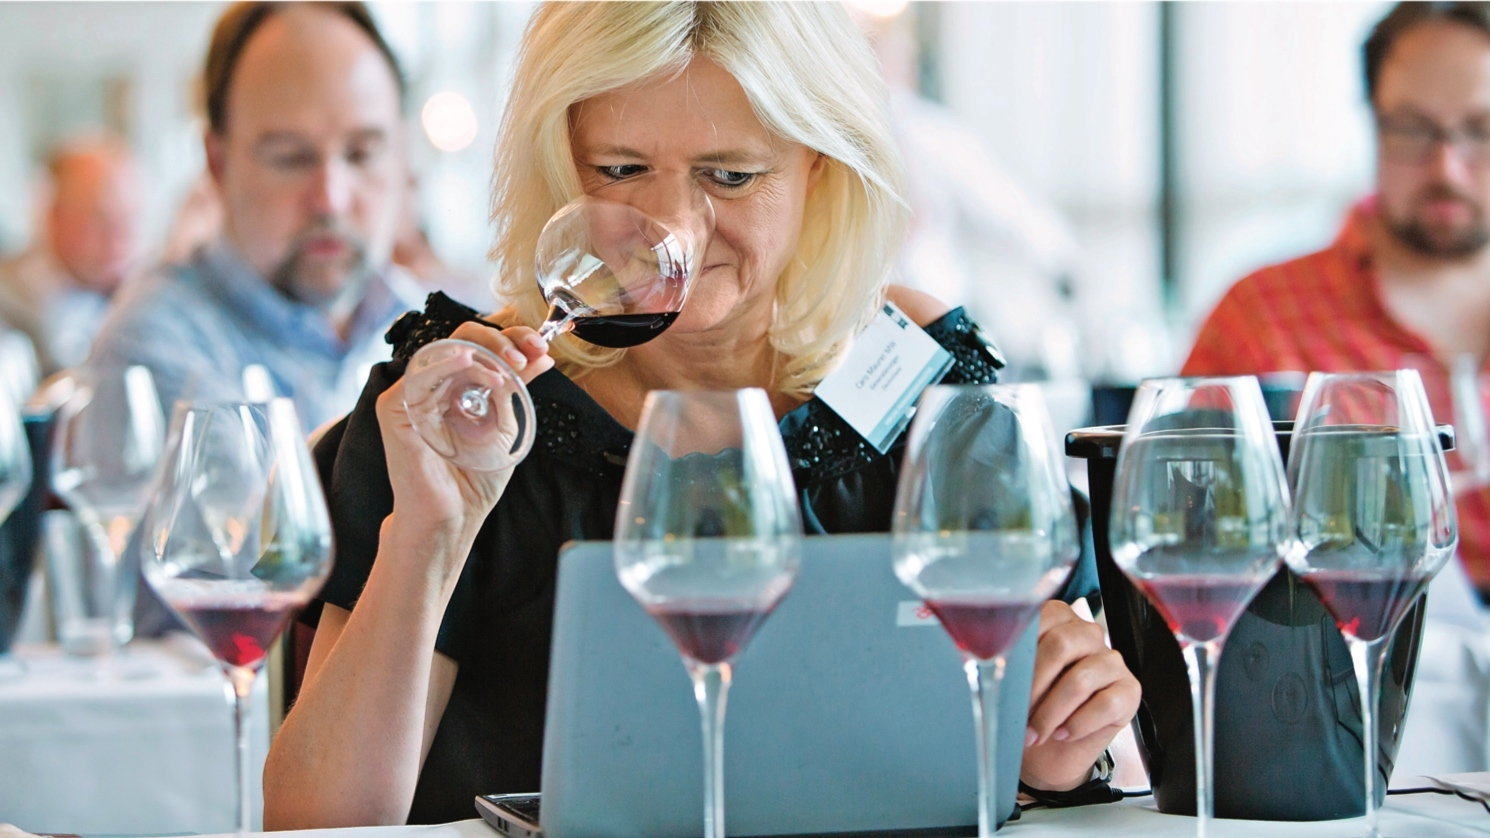 Caro Maurer, master of wine and Bavarian journalist